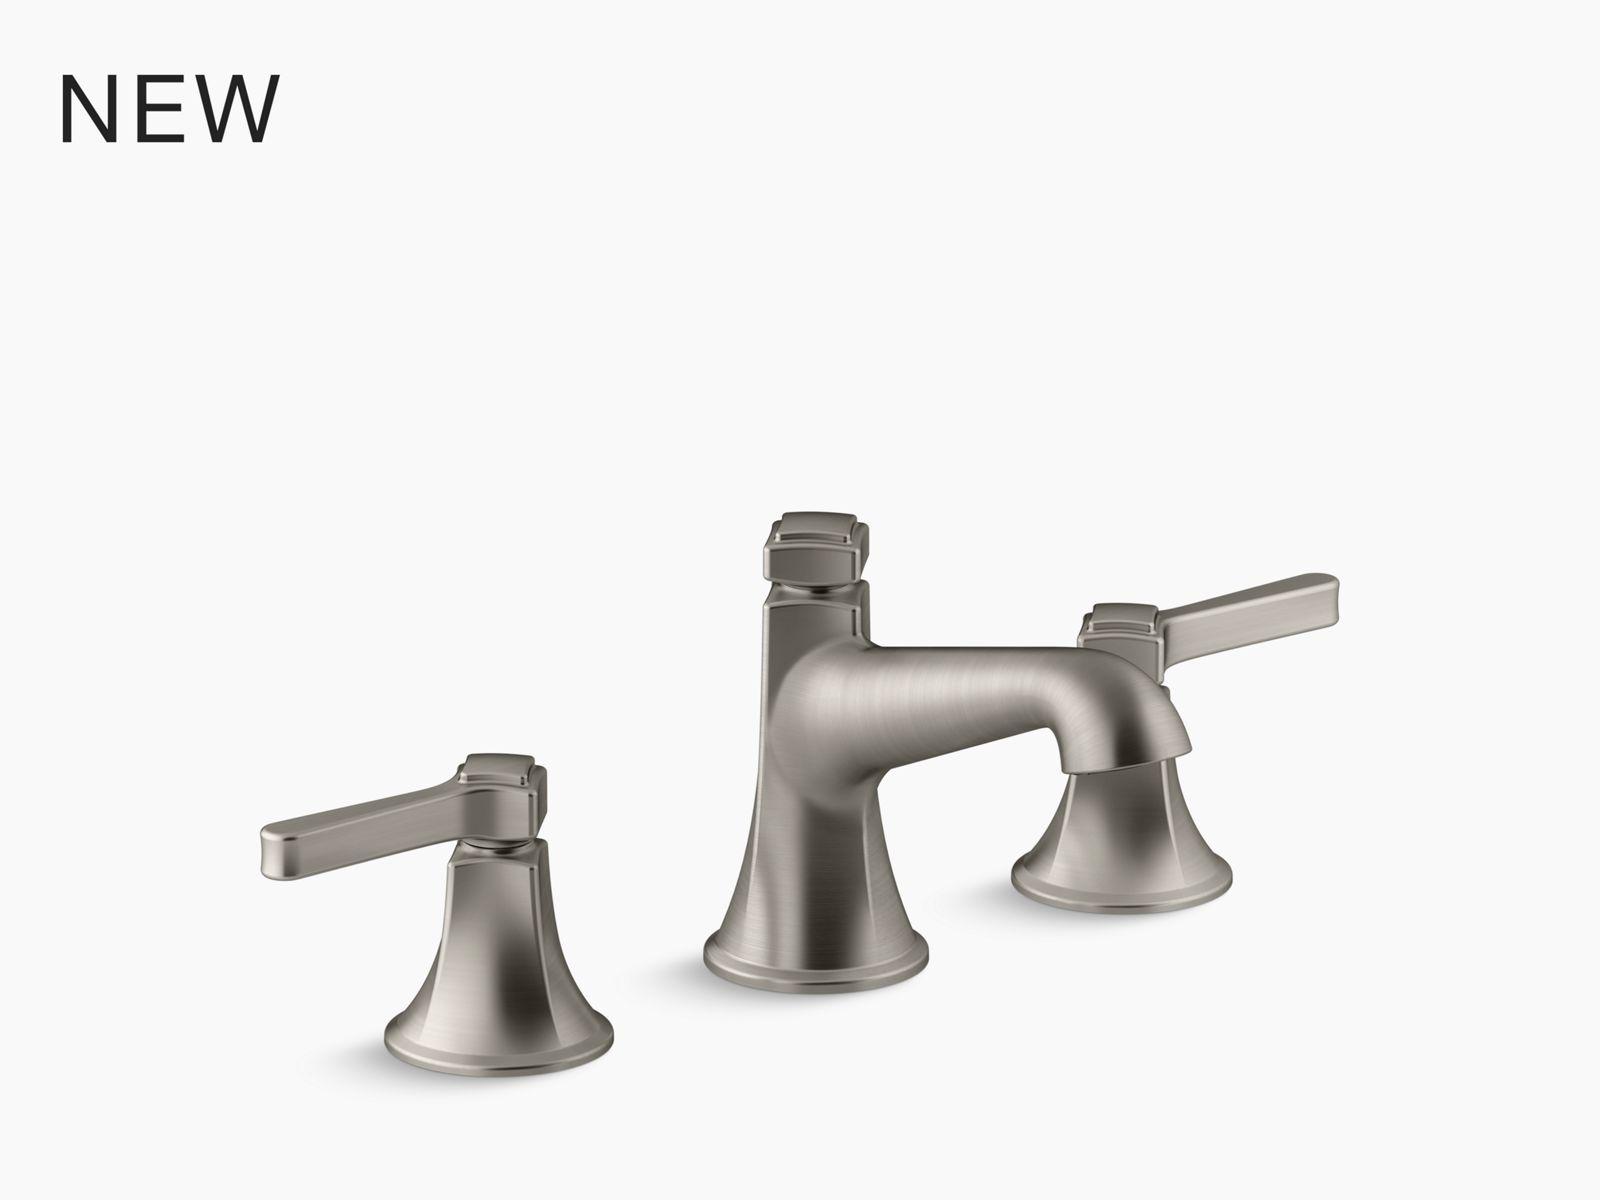 mayfield stainless steel sink rack 19 x 12 1 2